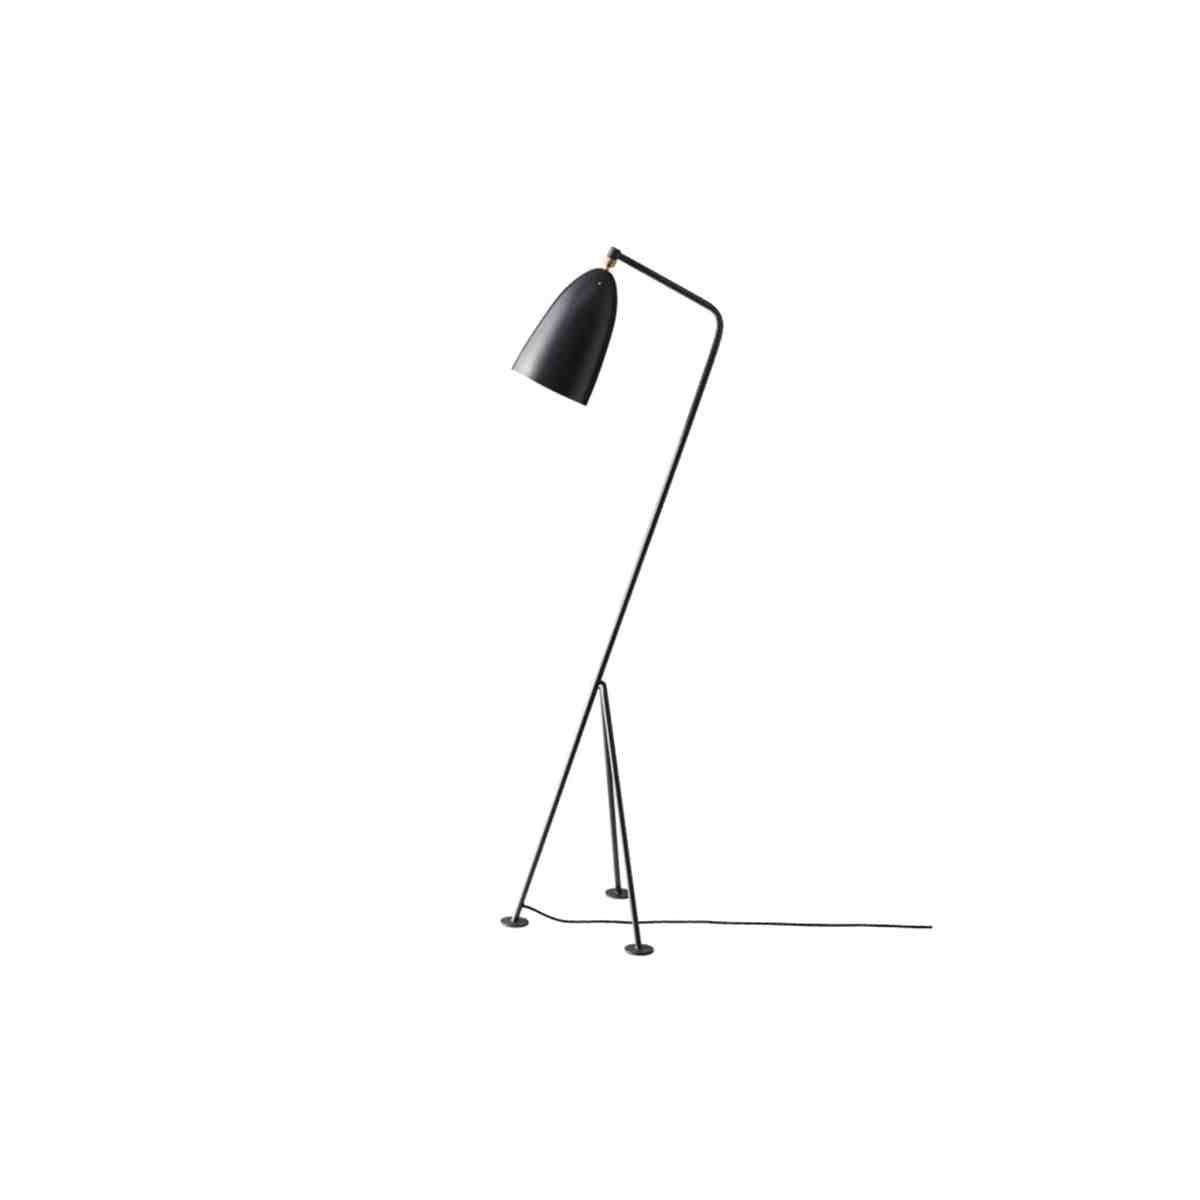 gubi-grashoppa-floor-lamp-anthracite-grey-001